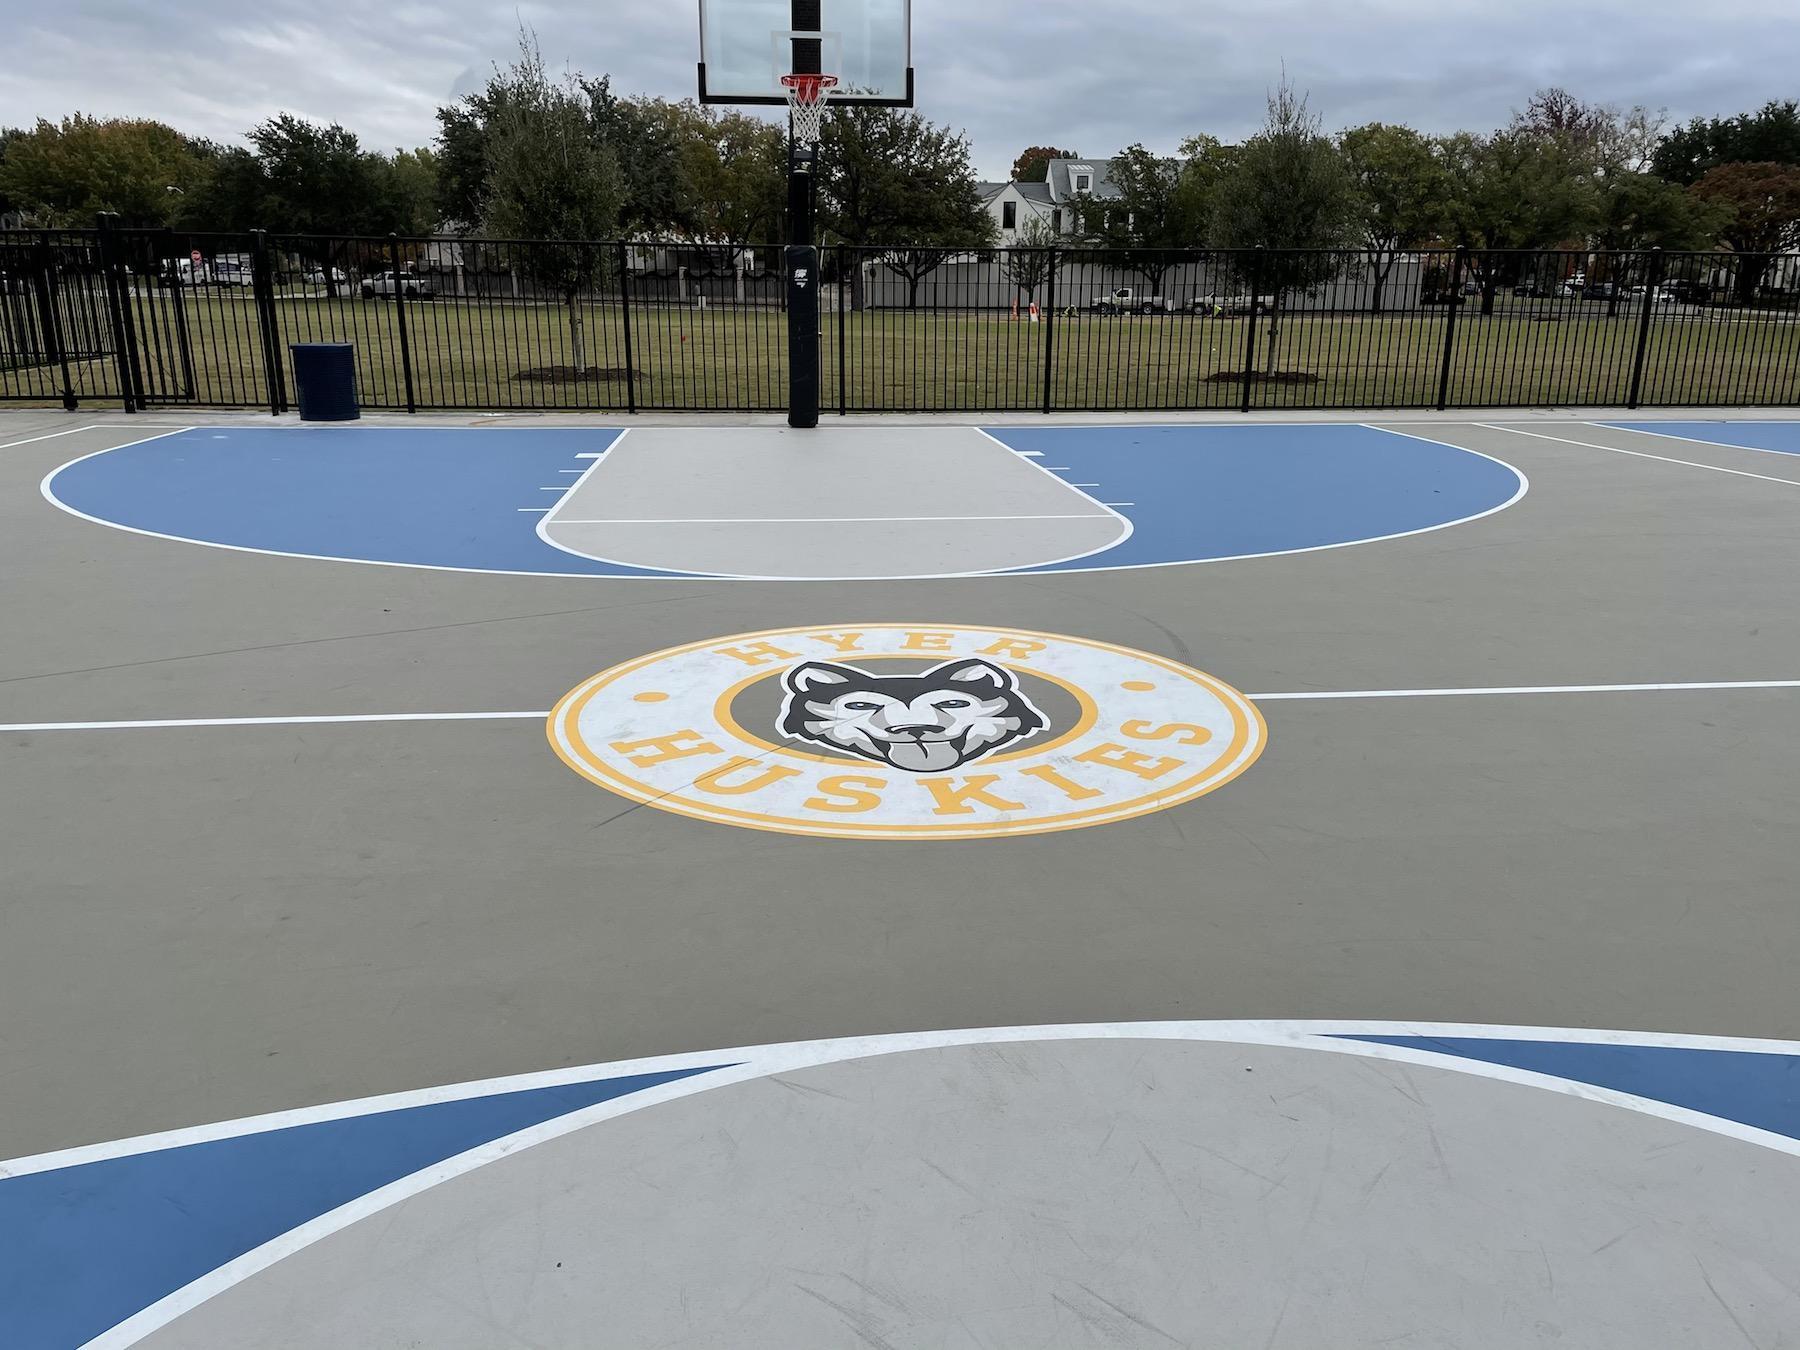 Hyer Elementary Basketball Court